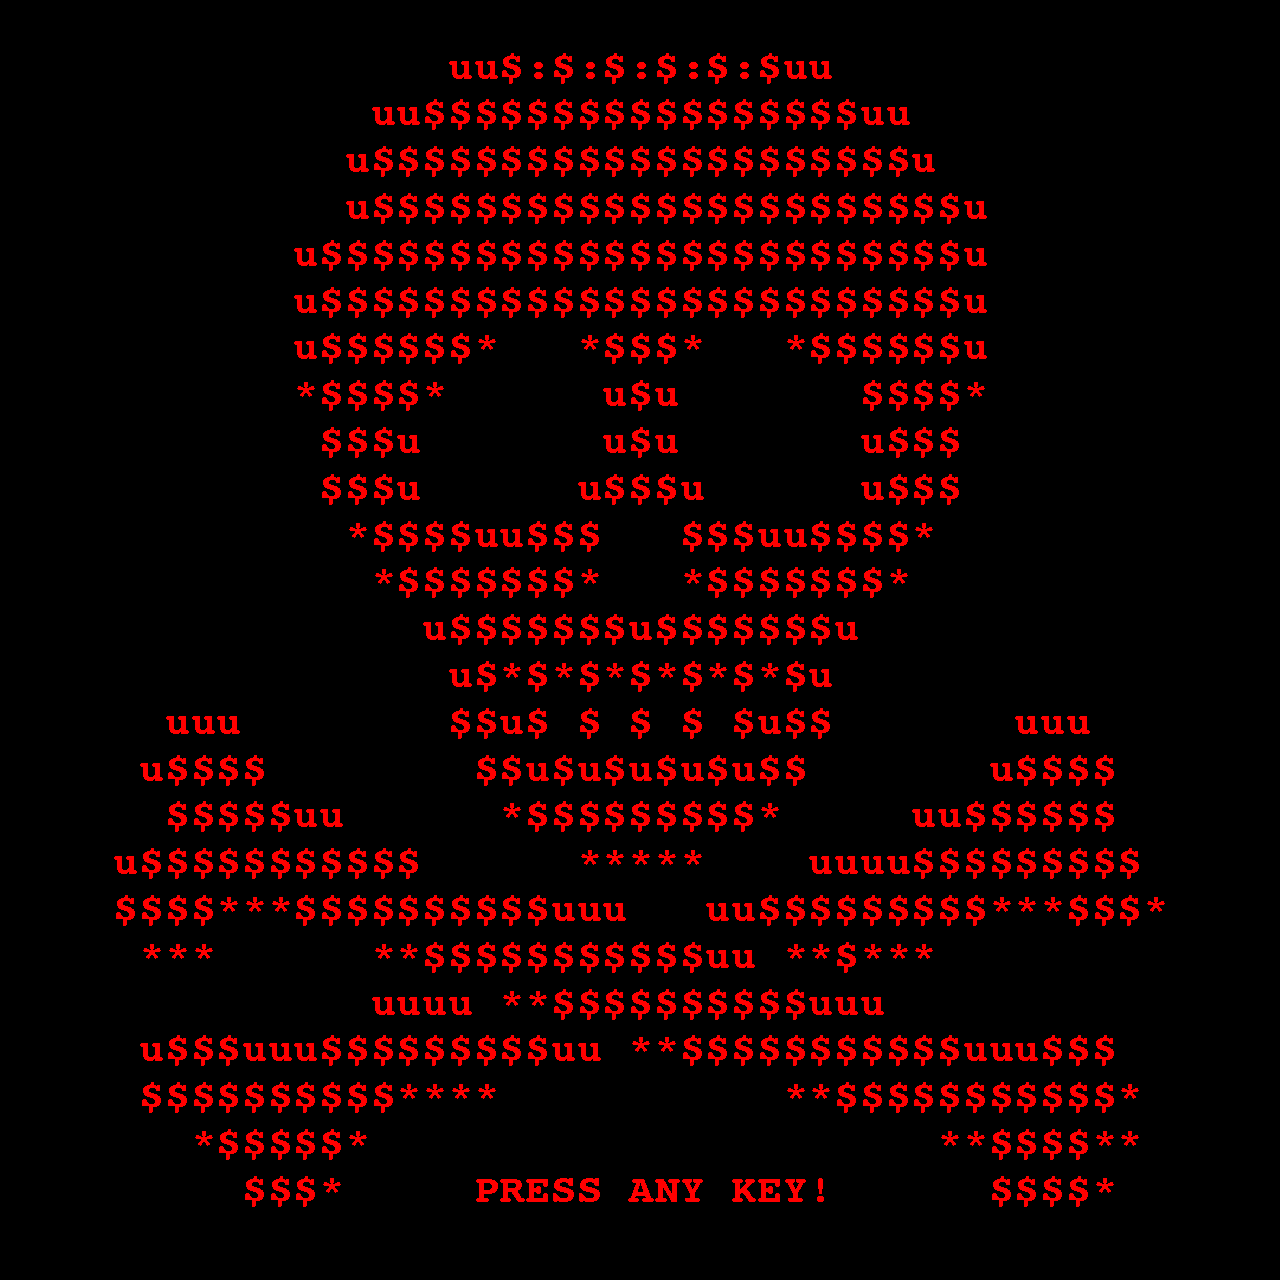 Petya ransomware eats your hard drives